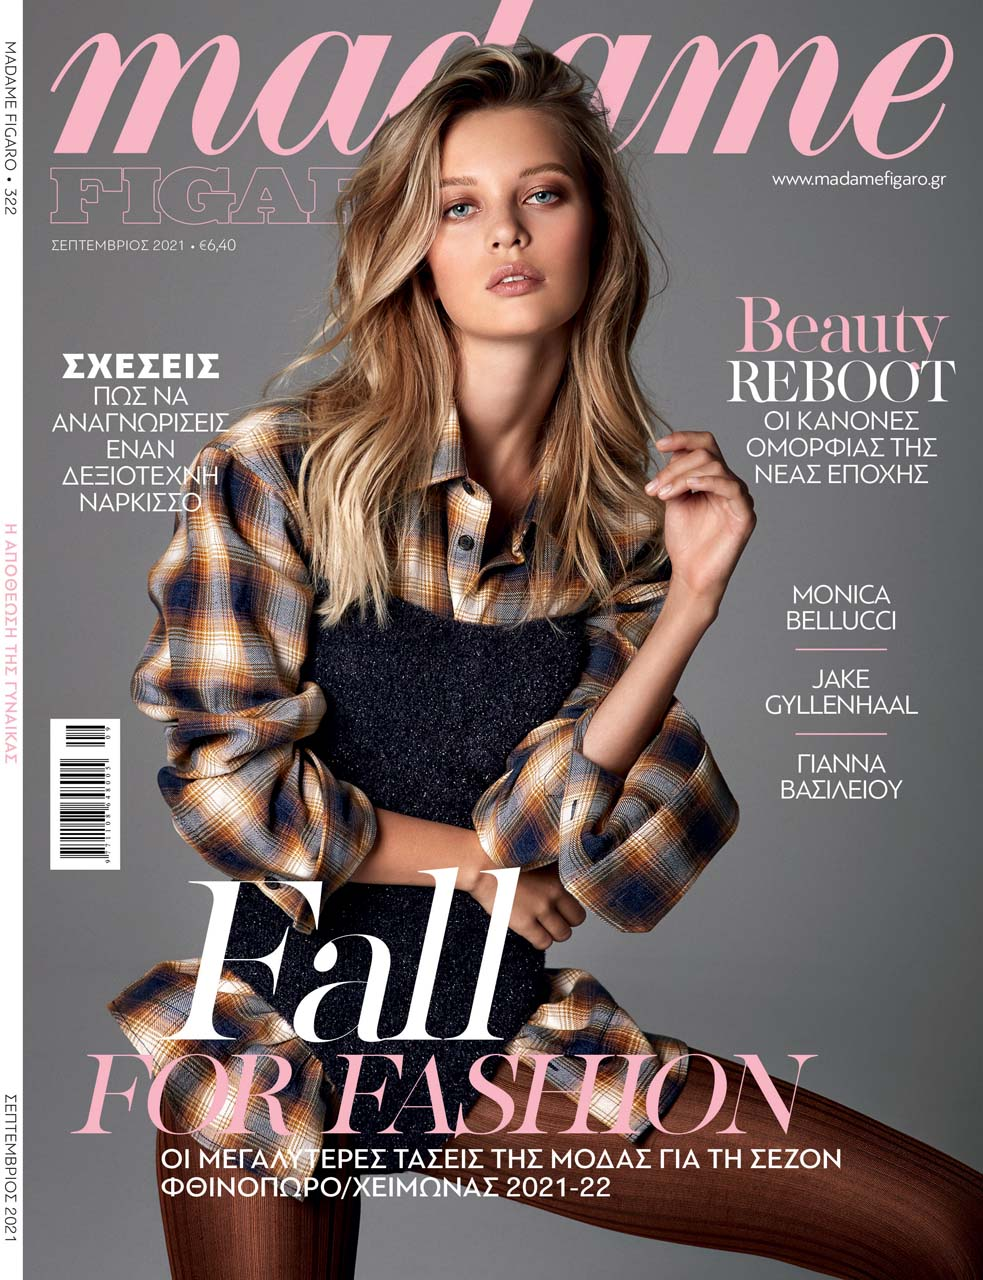 Dia Anitska on the cover of Madame Figaro